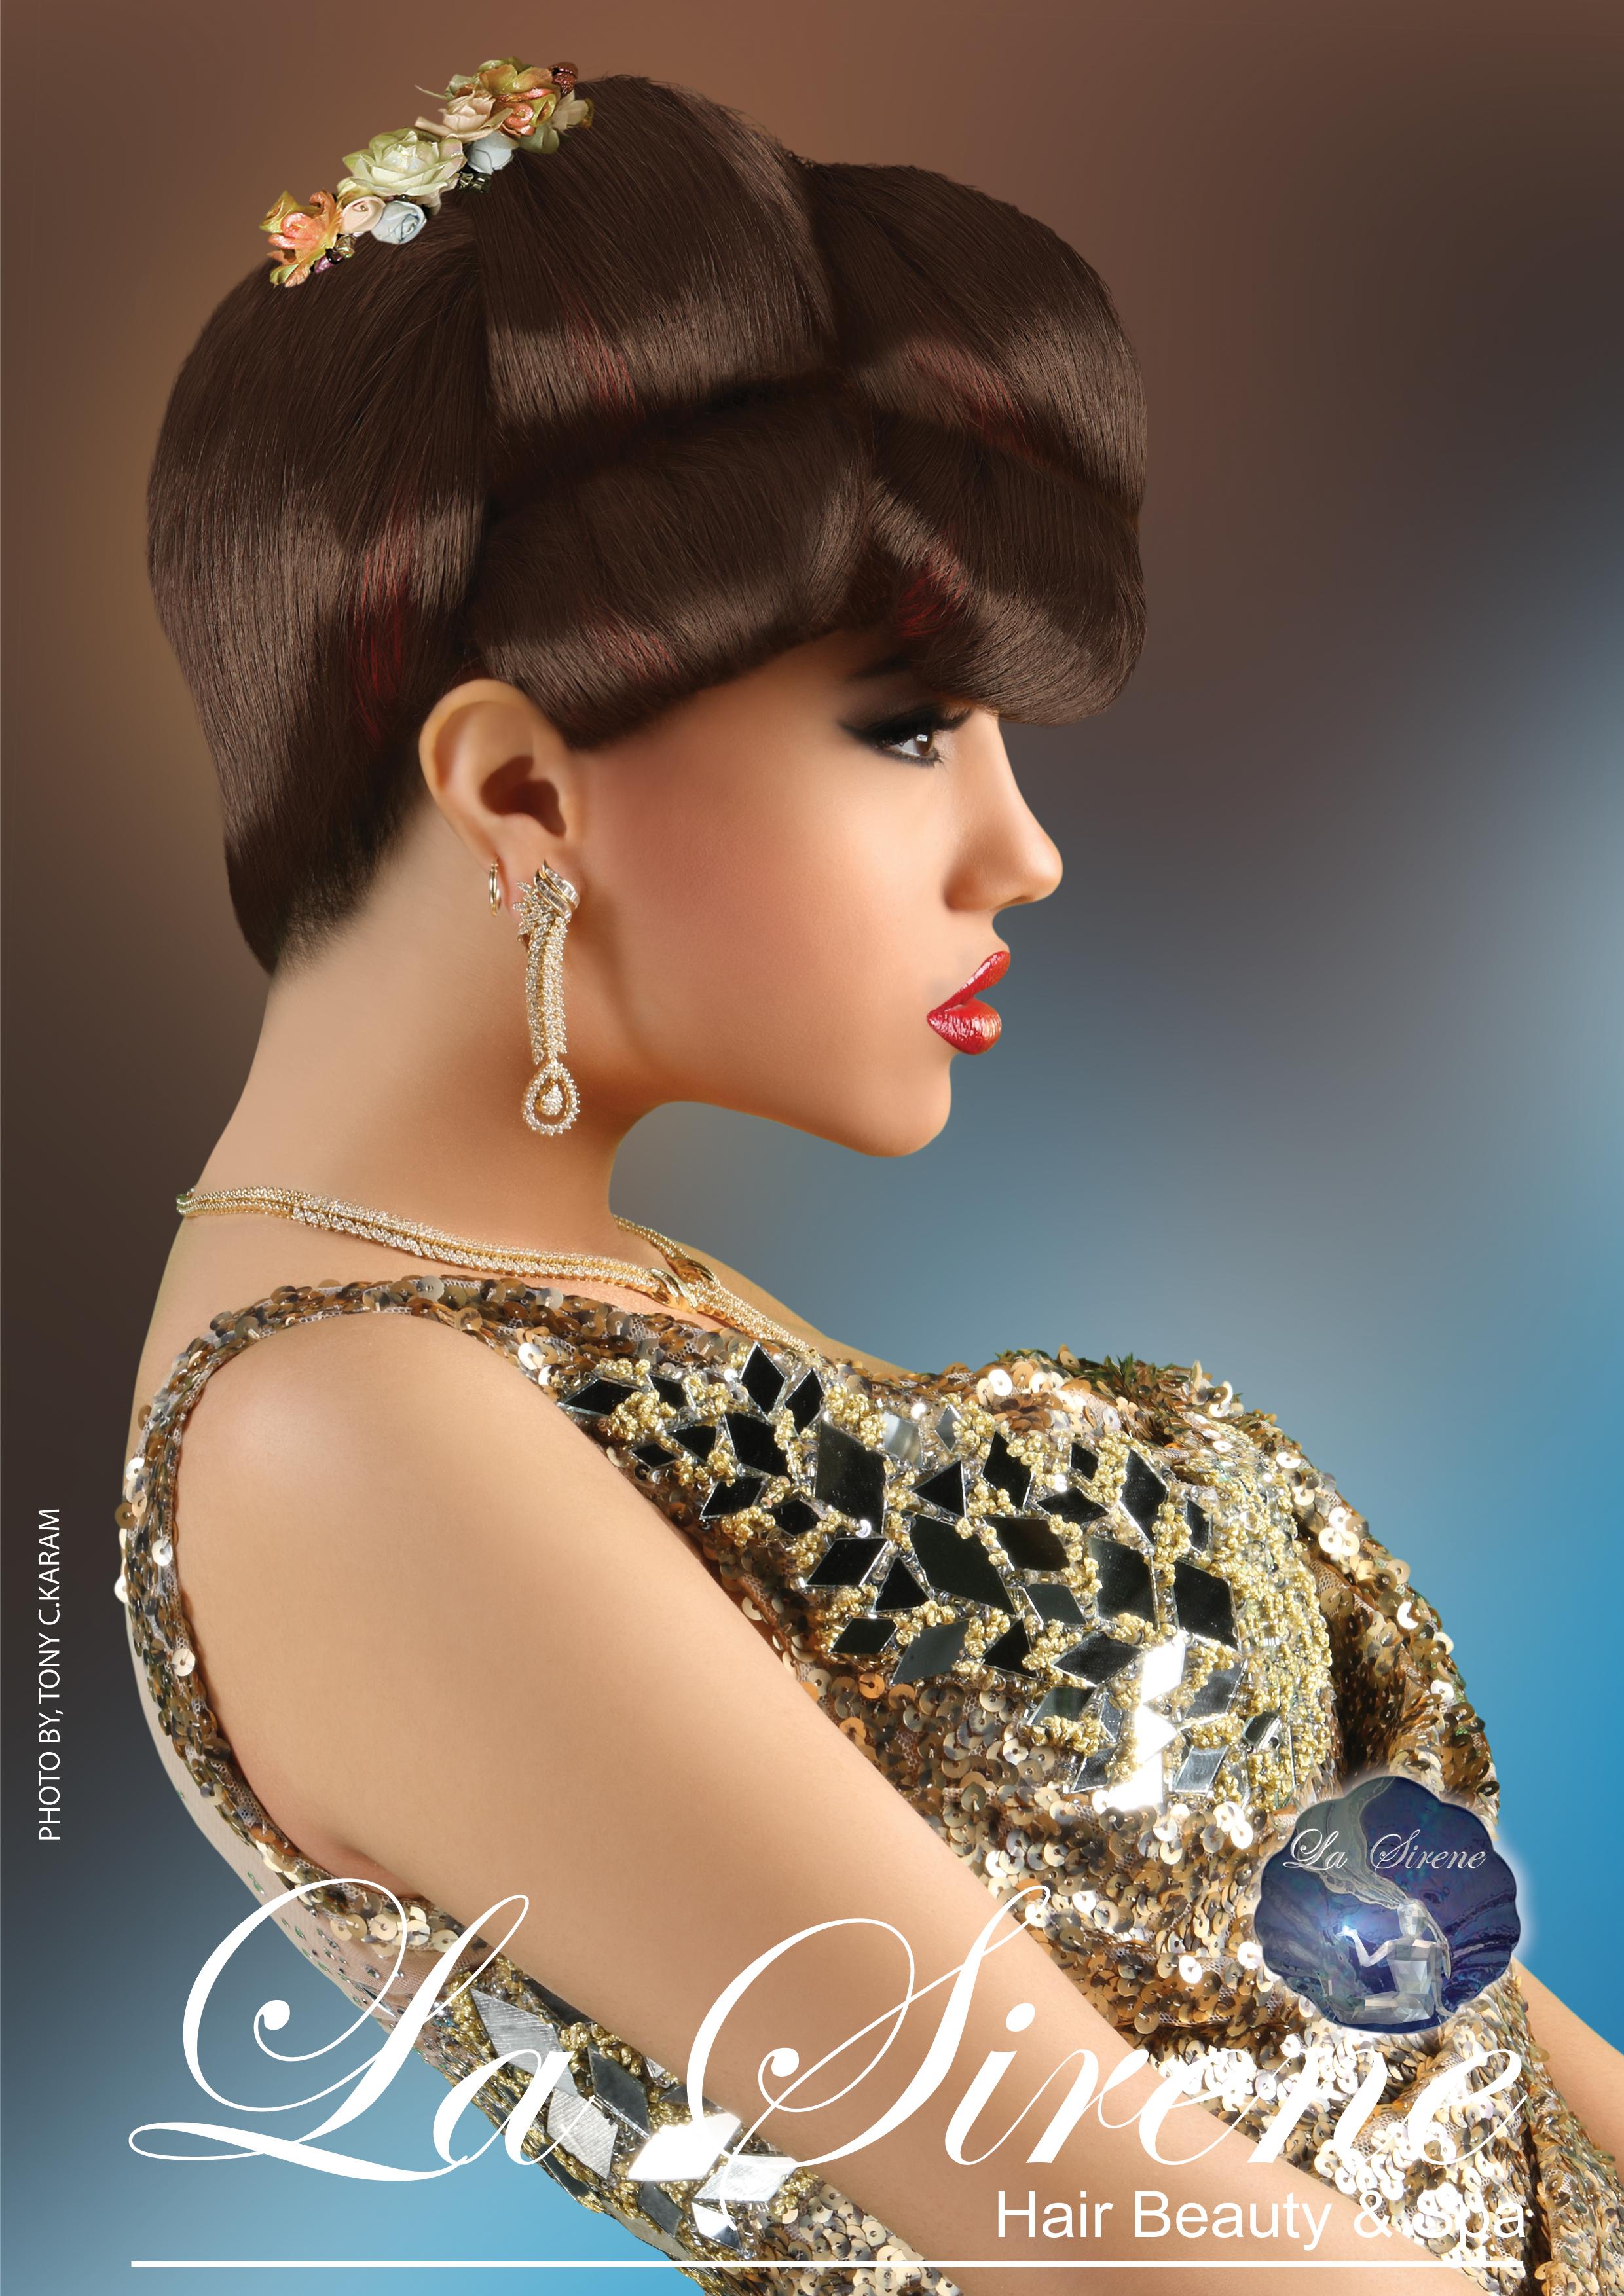 La Sirene Beauty Hair